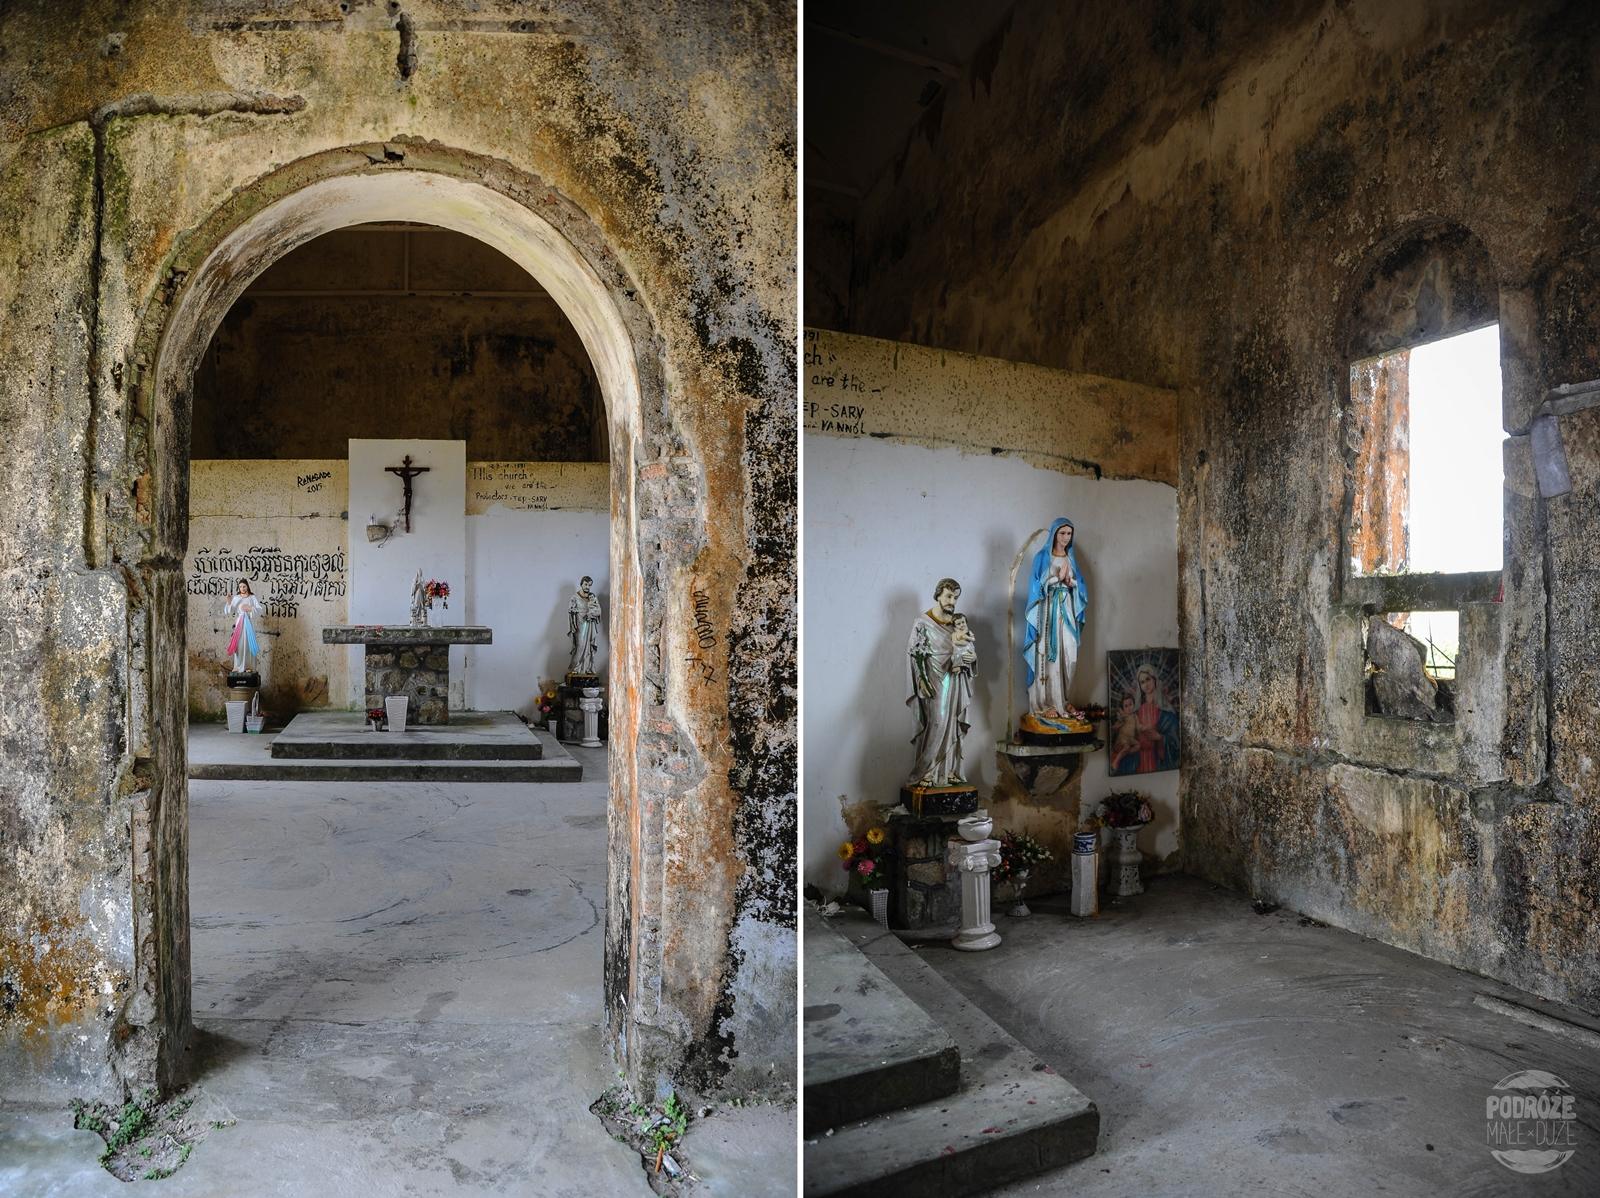 kambodza kampot bokor hill station opuszczony kosciol